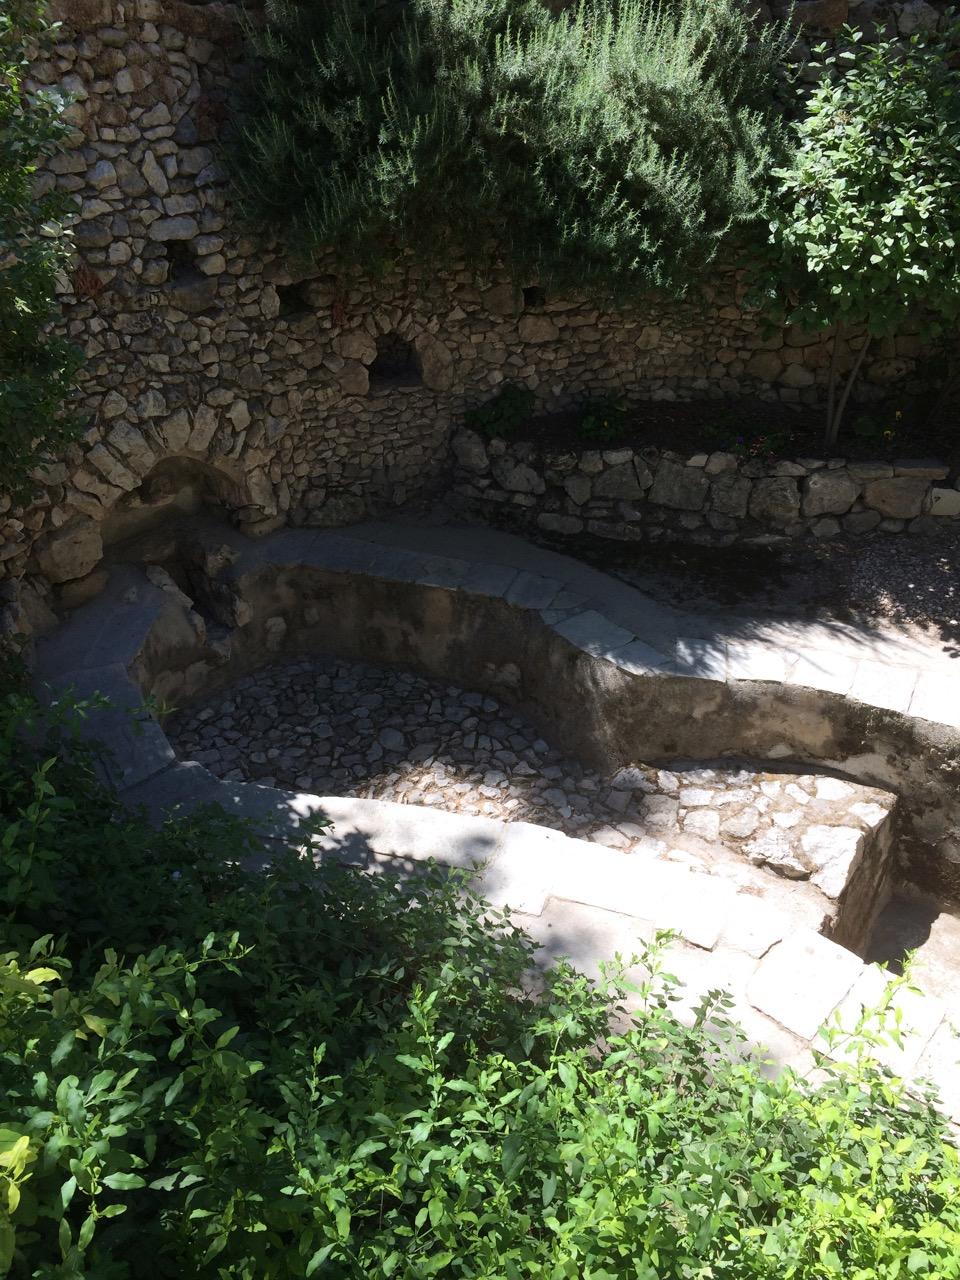 The Wine Press near the Garden Tomb, Jerusalem